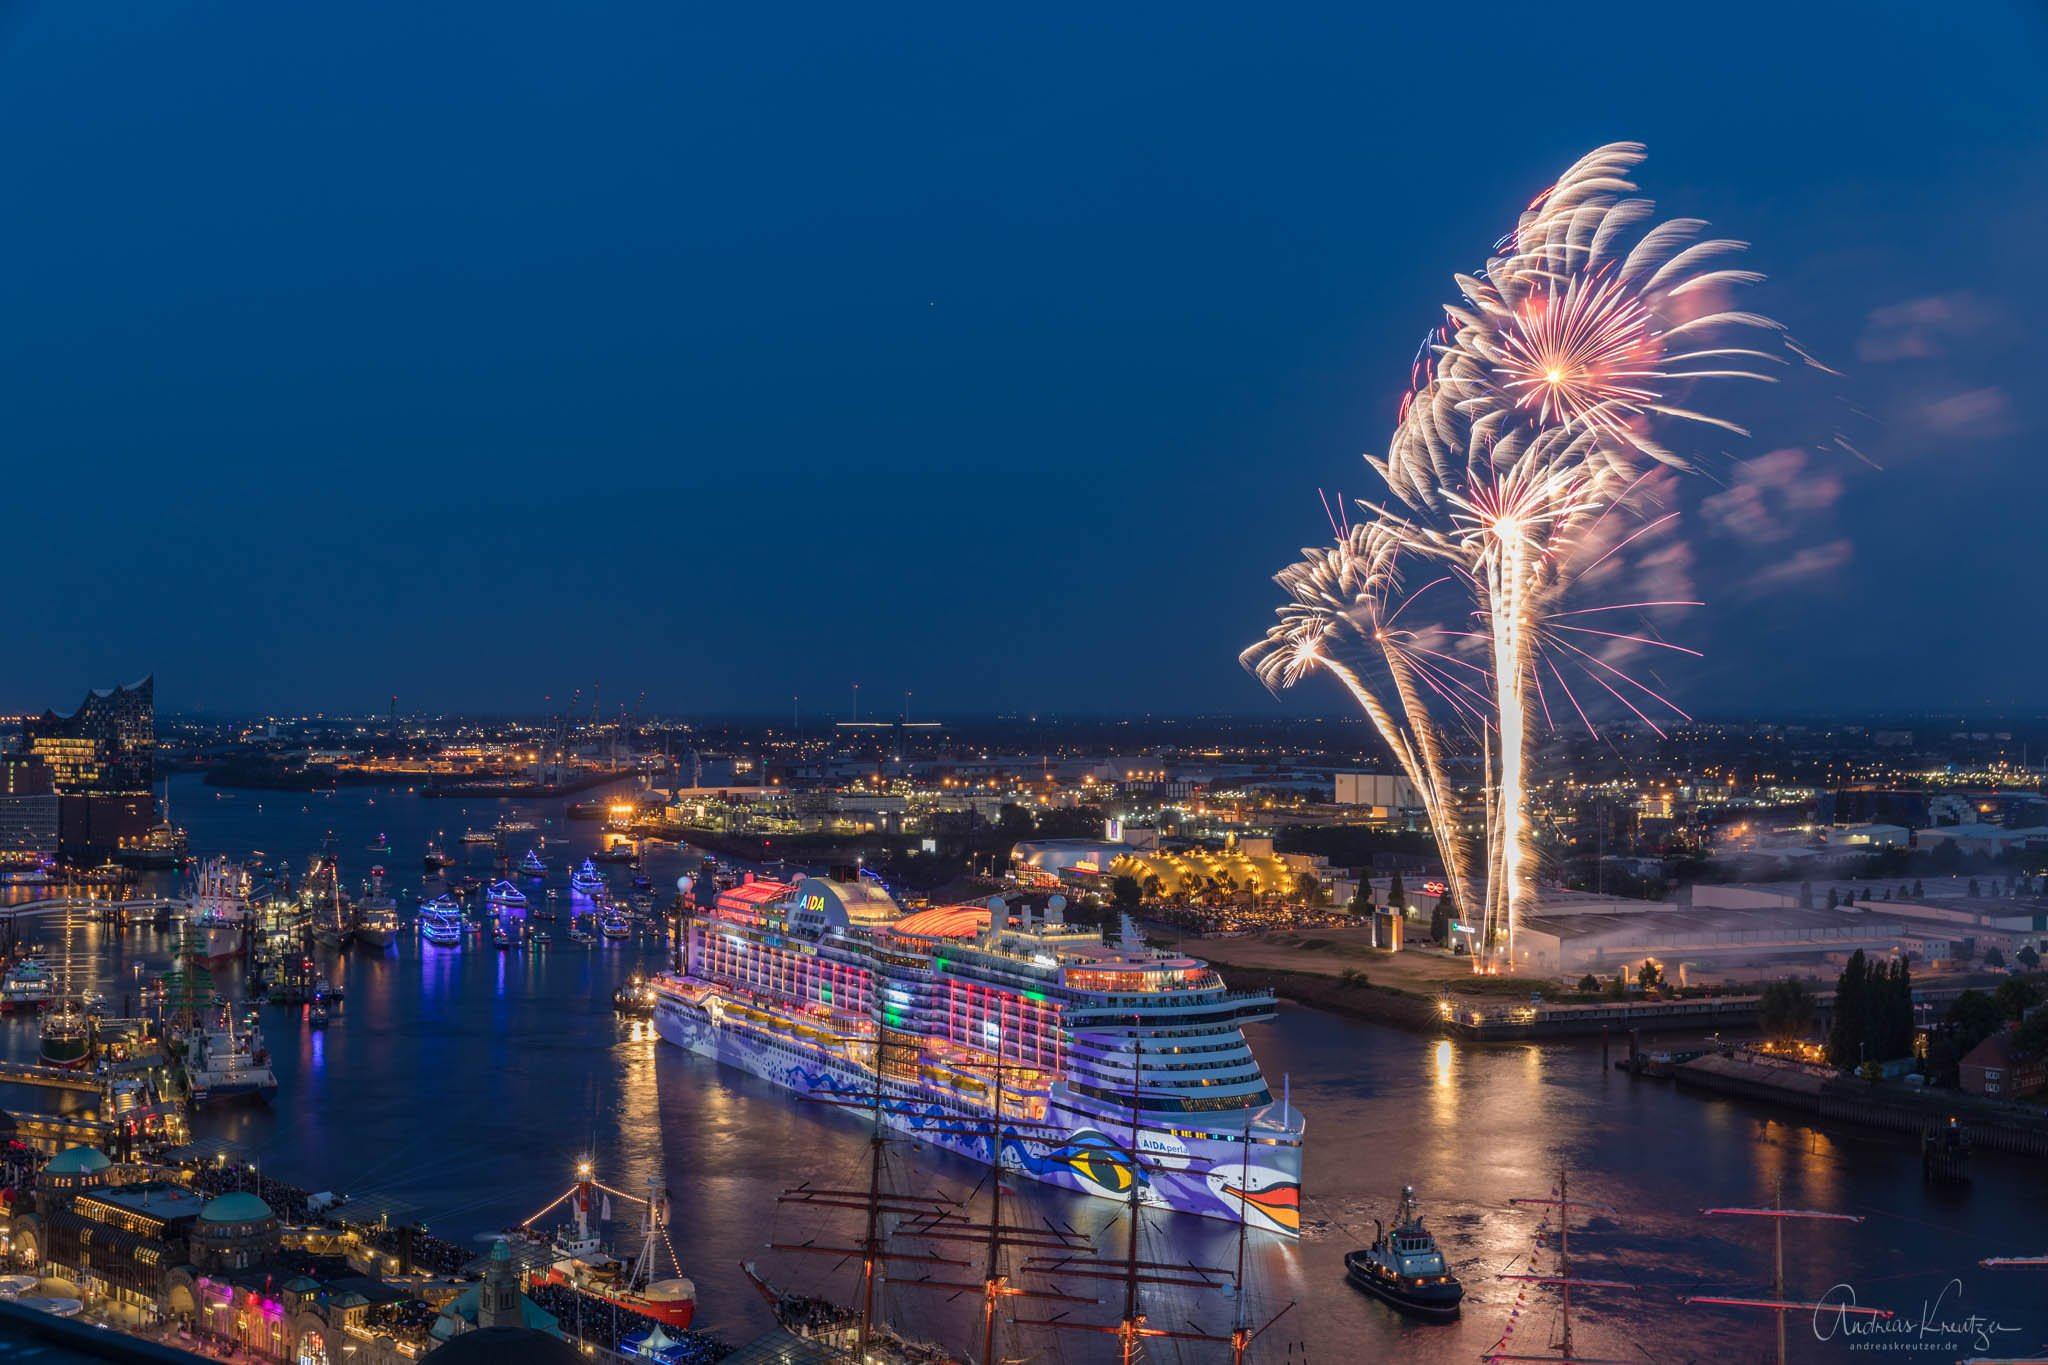 AIDA Feuerwerk zum 829. Hafengengeburtstag in Hamburg